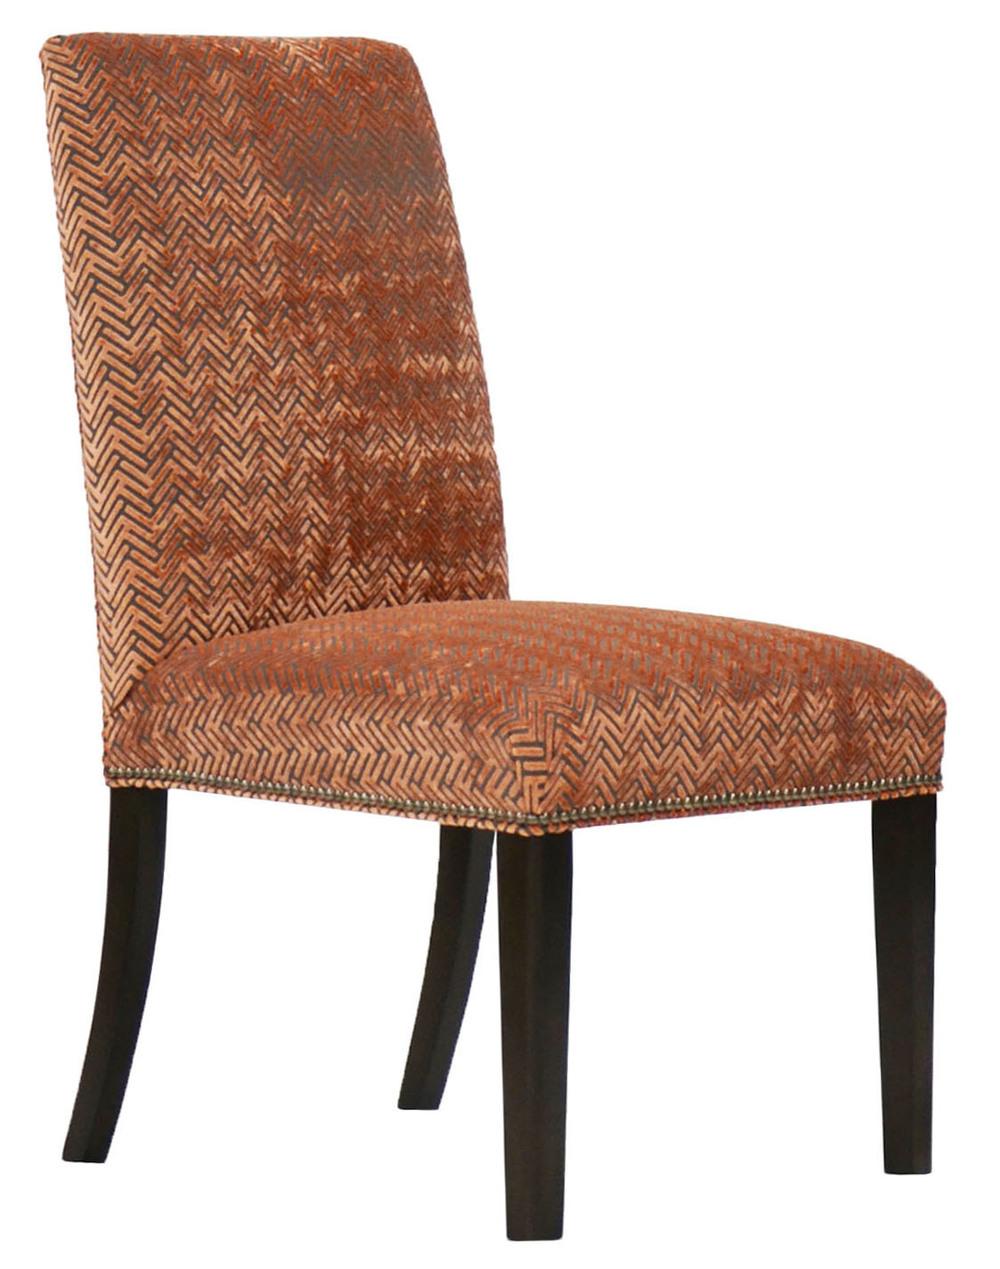 Vanguard Furniture - Bailey Side Chair